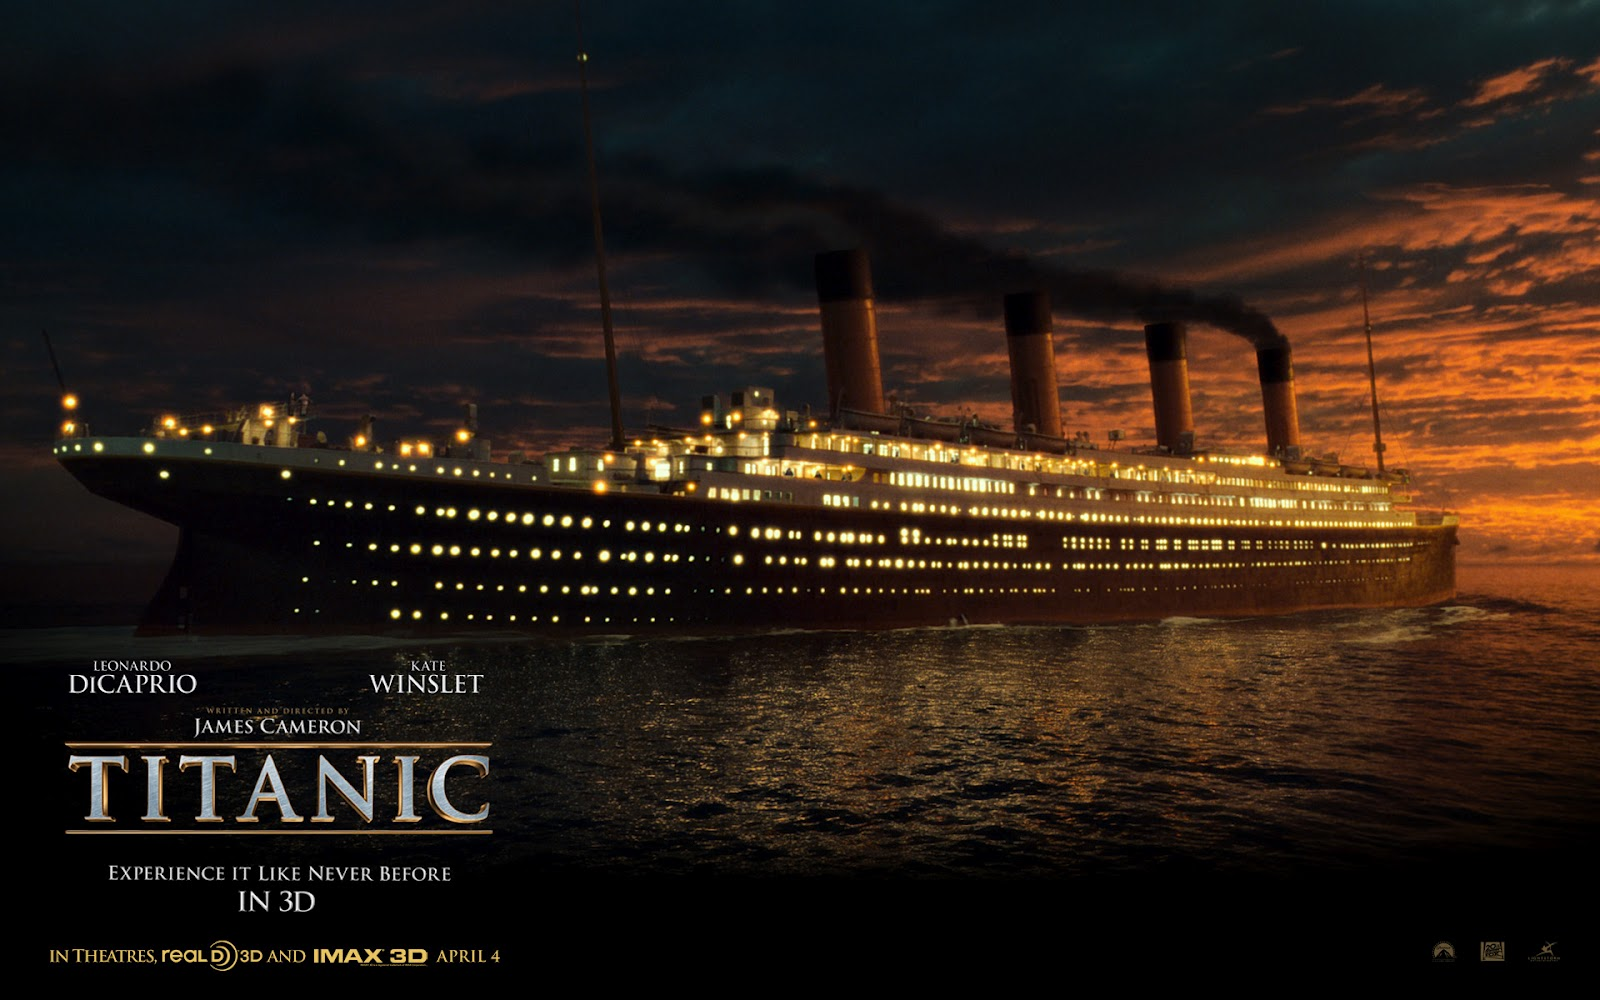 http://3.bp.blogspot.com/-U5DbUYi96bs/T0U-Sr4I6ZI/AAAAAAAAFKU/Hp2g0rf7CSA/s1600/Titanic+3D+03.jpg